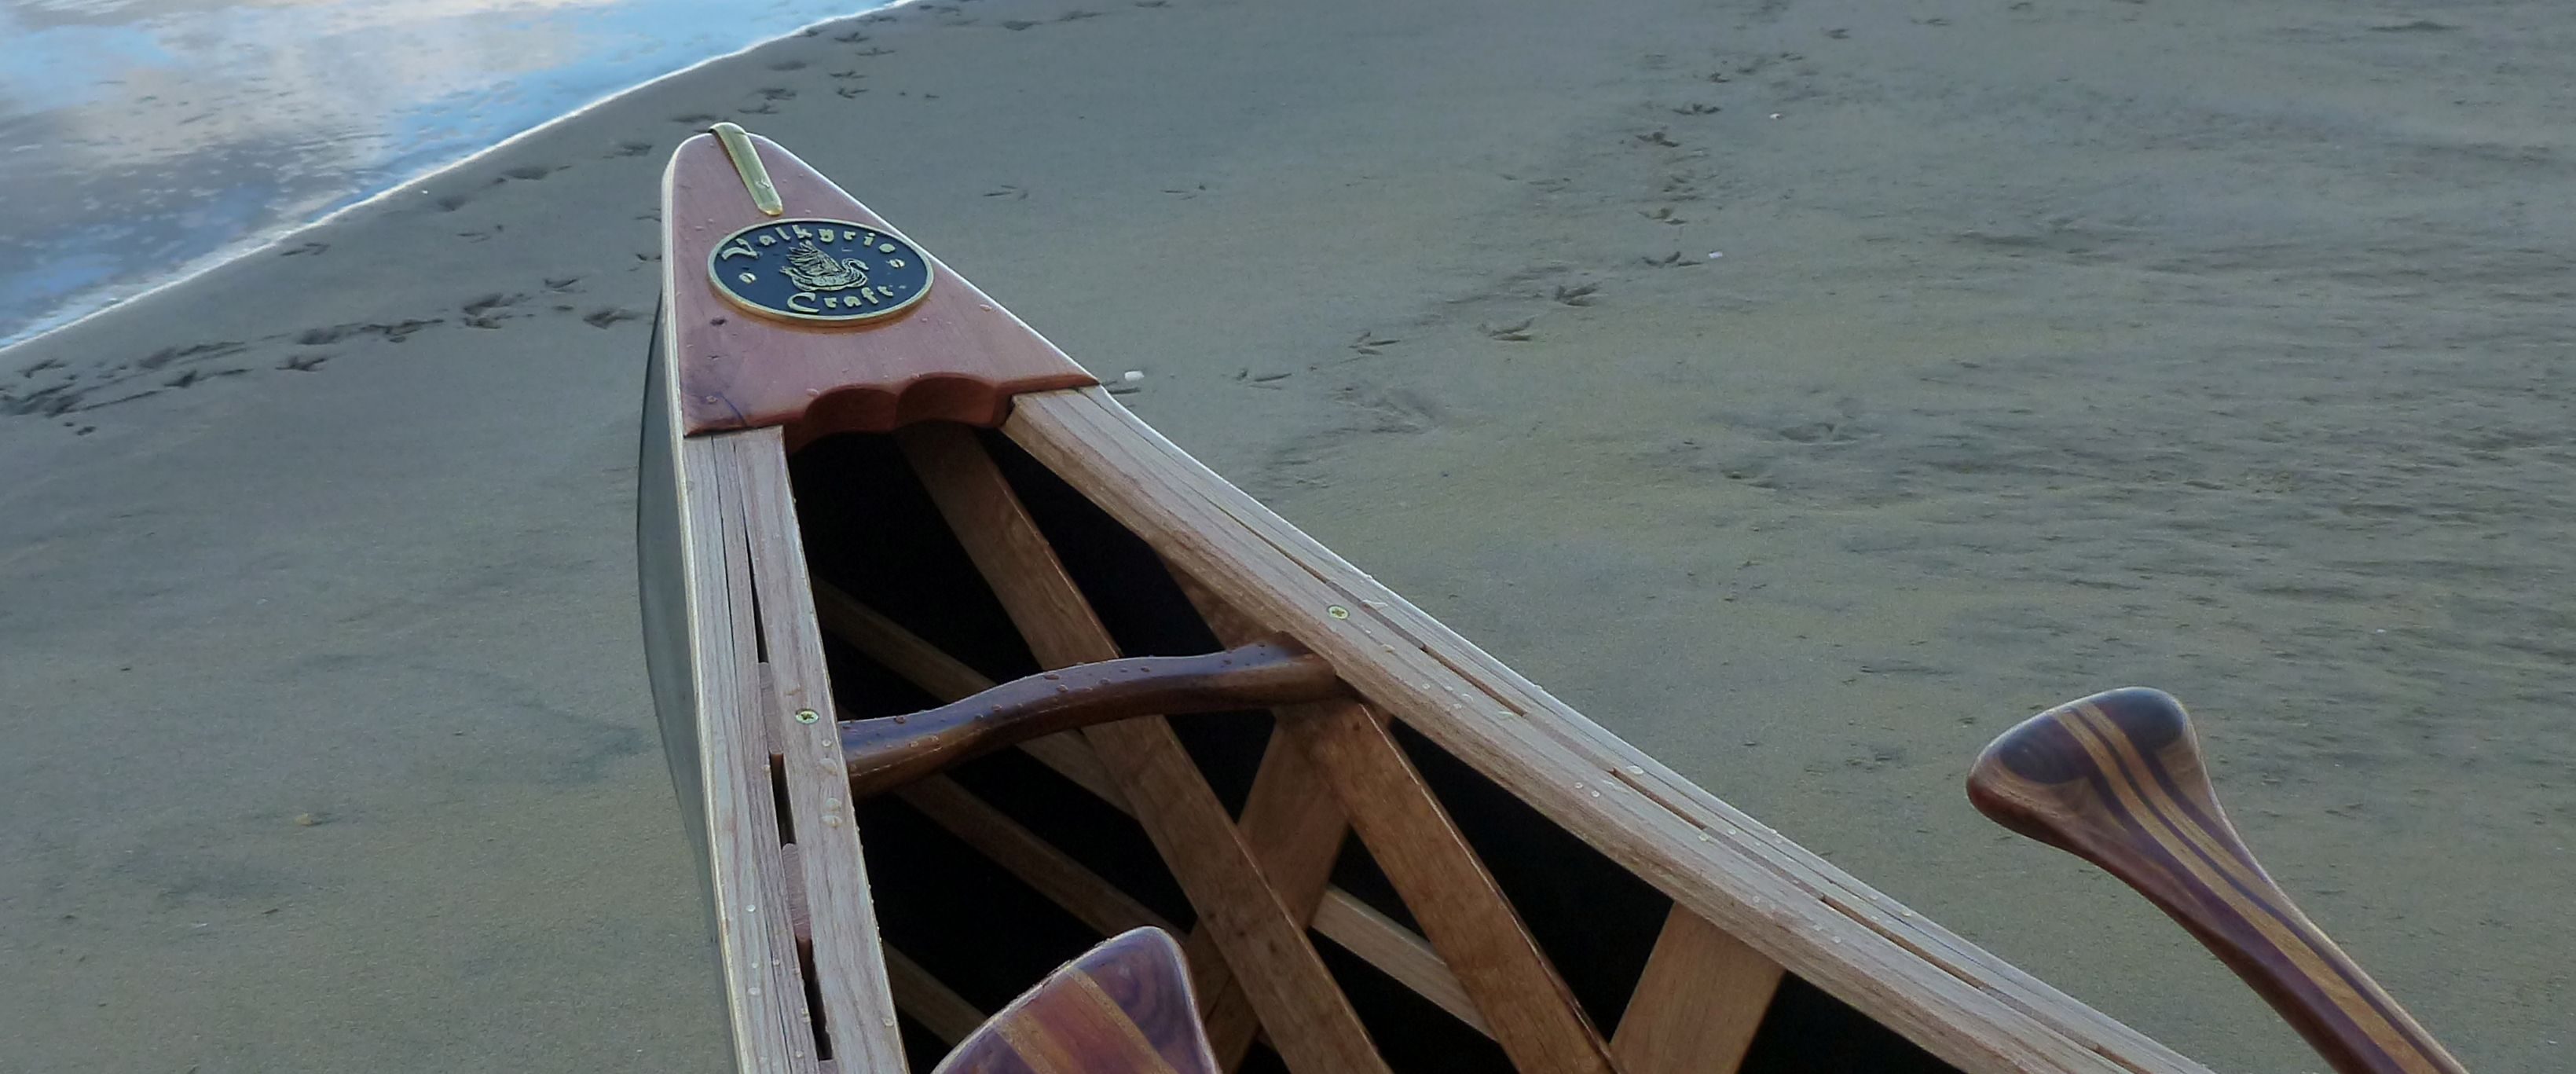 Mist - Skin on Frame Lightweight Open Canoe - Valkyrie Craft